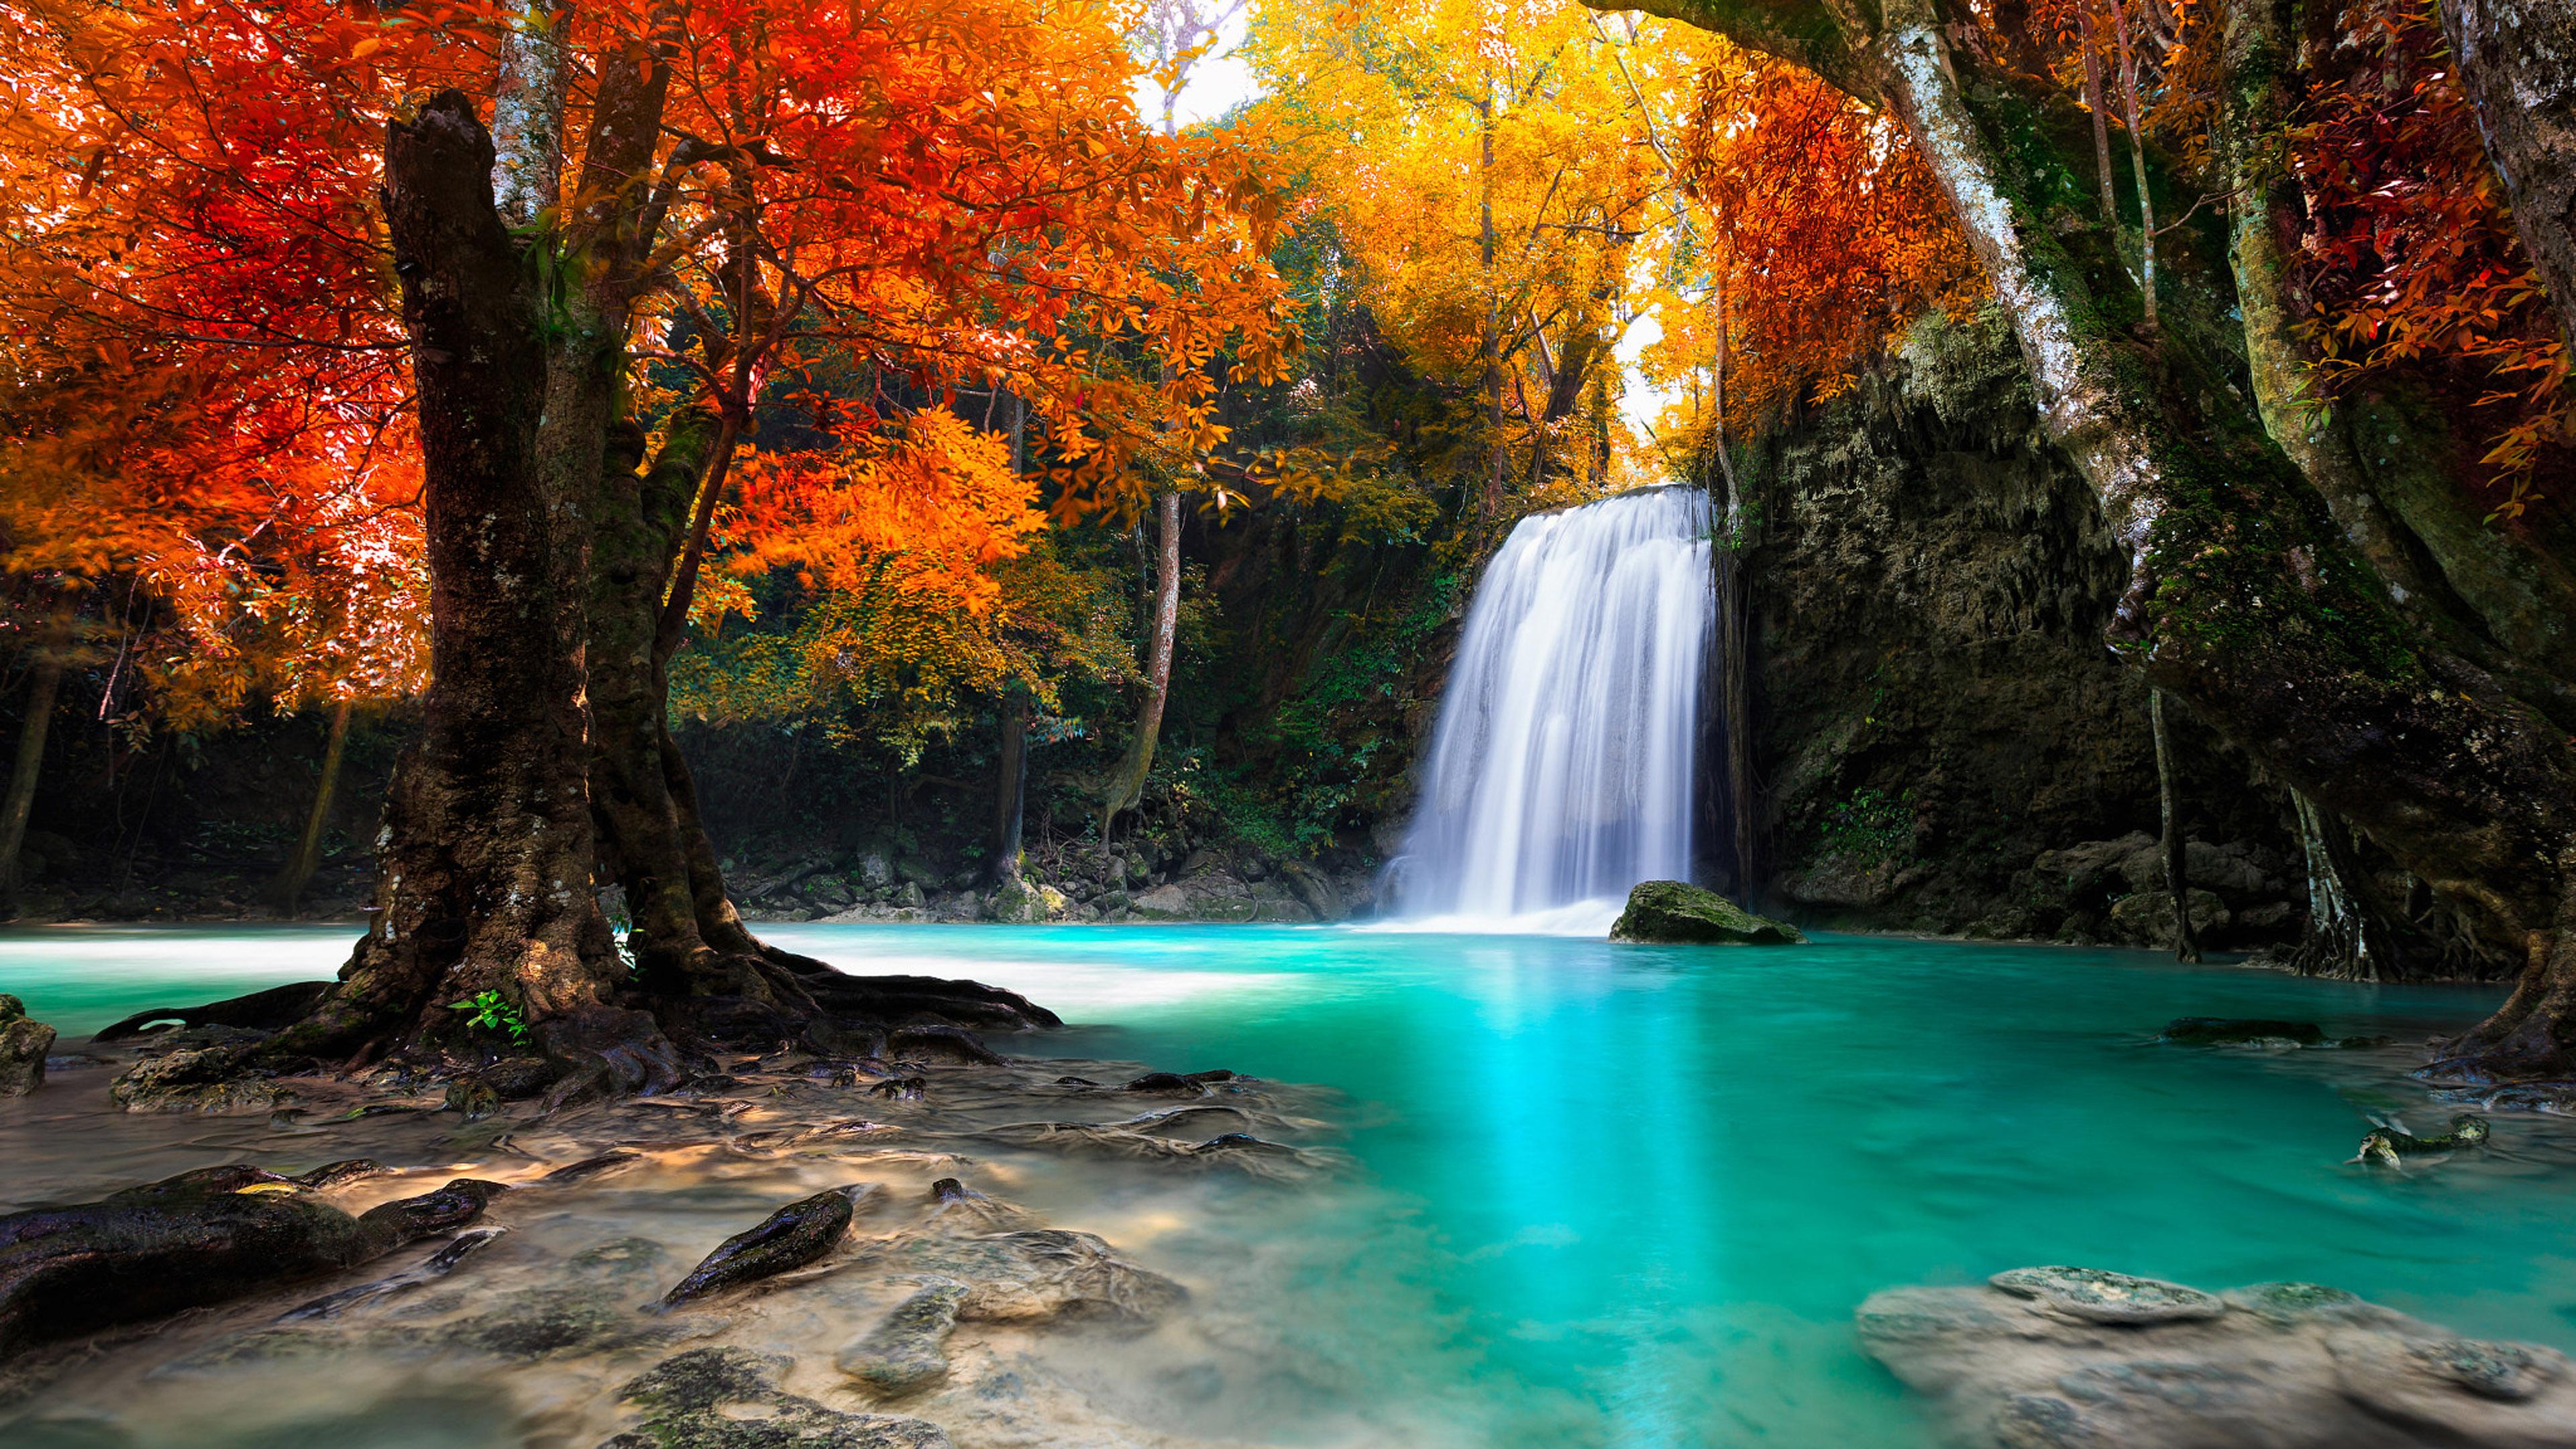 Hd Wallpaper Fall Leaves Waterfall In Kanjanaburi Thailand Landscapes Wallpaper